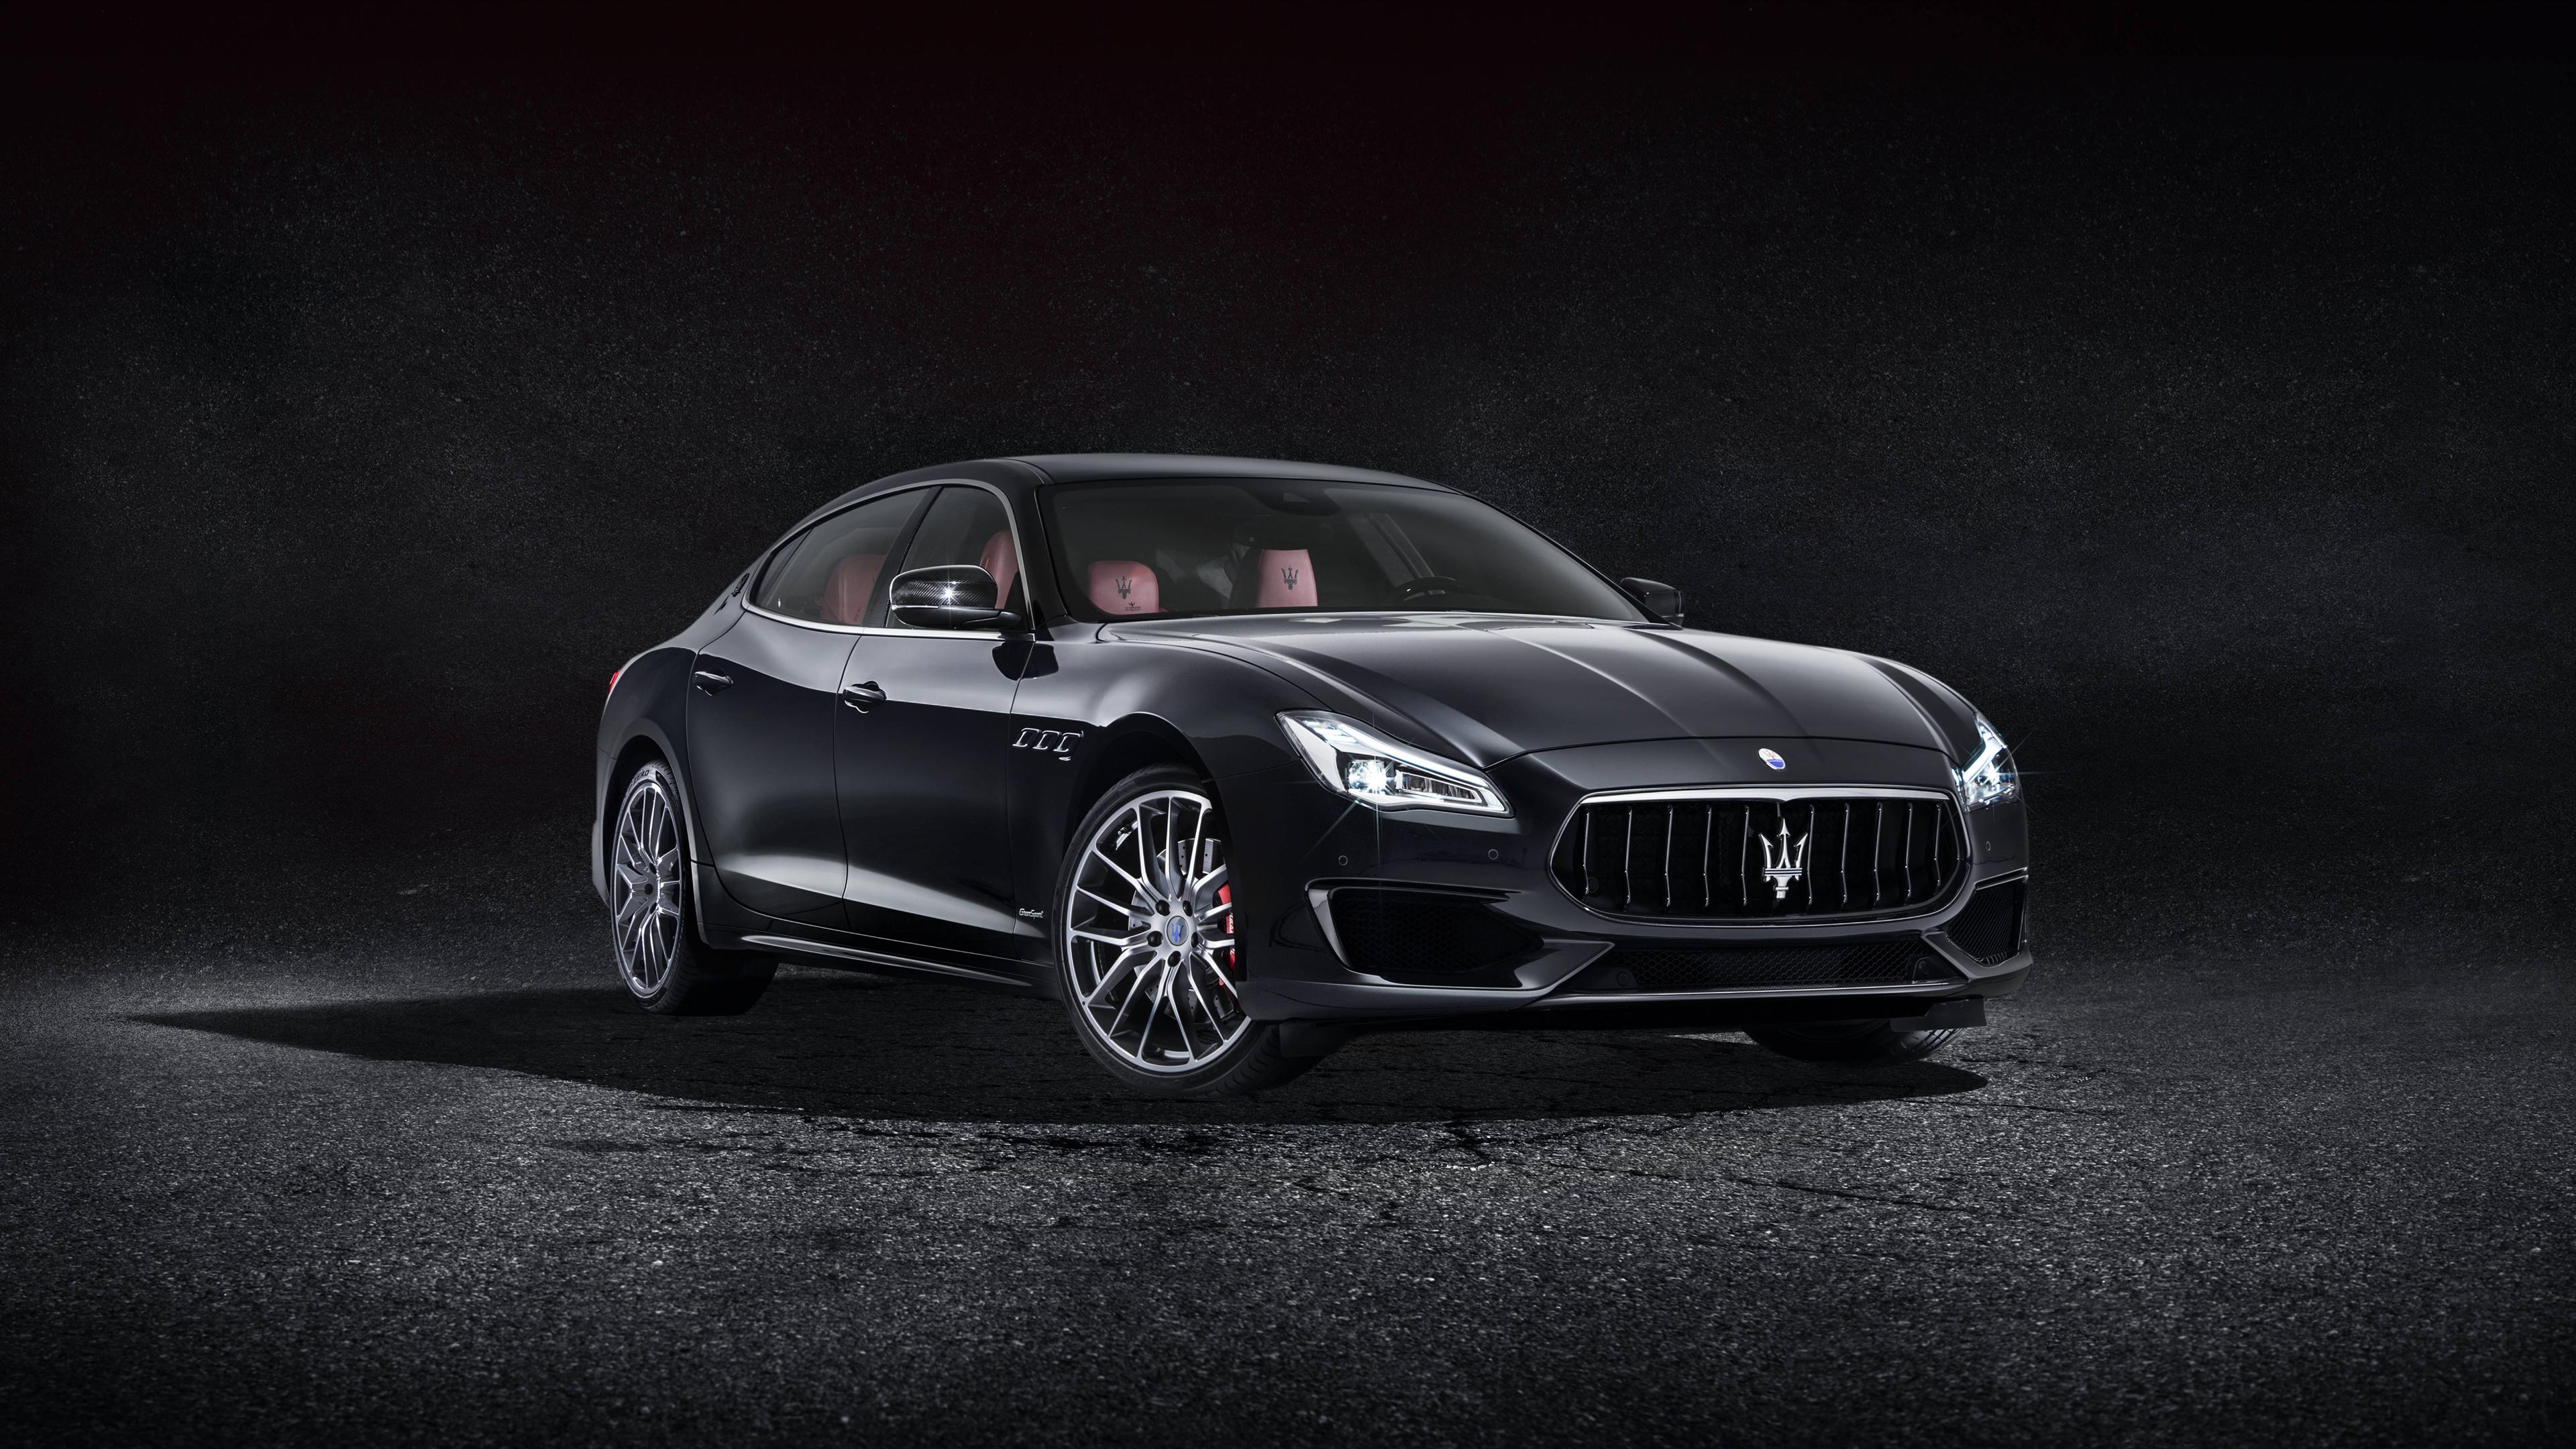 Download 3840x2160 Wallpaper 2017 Black Maserati